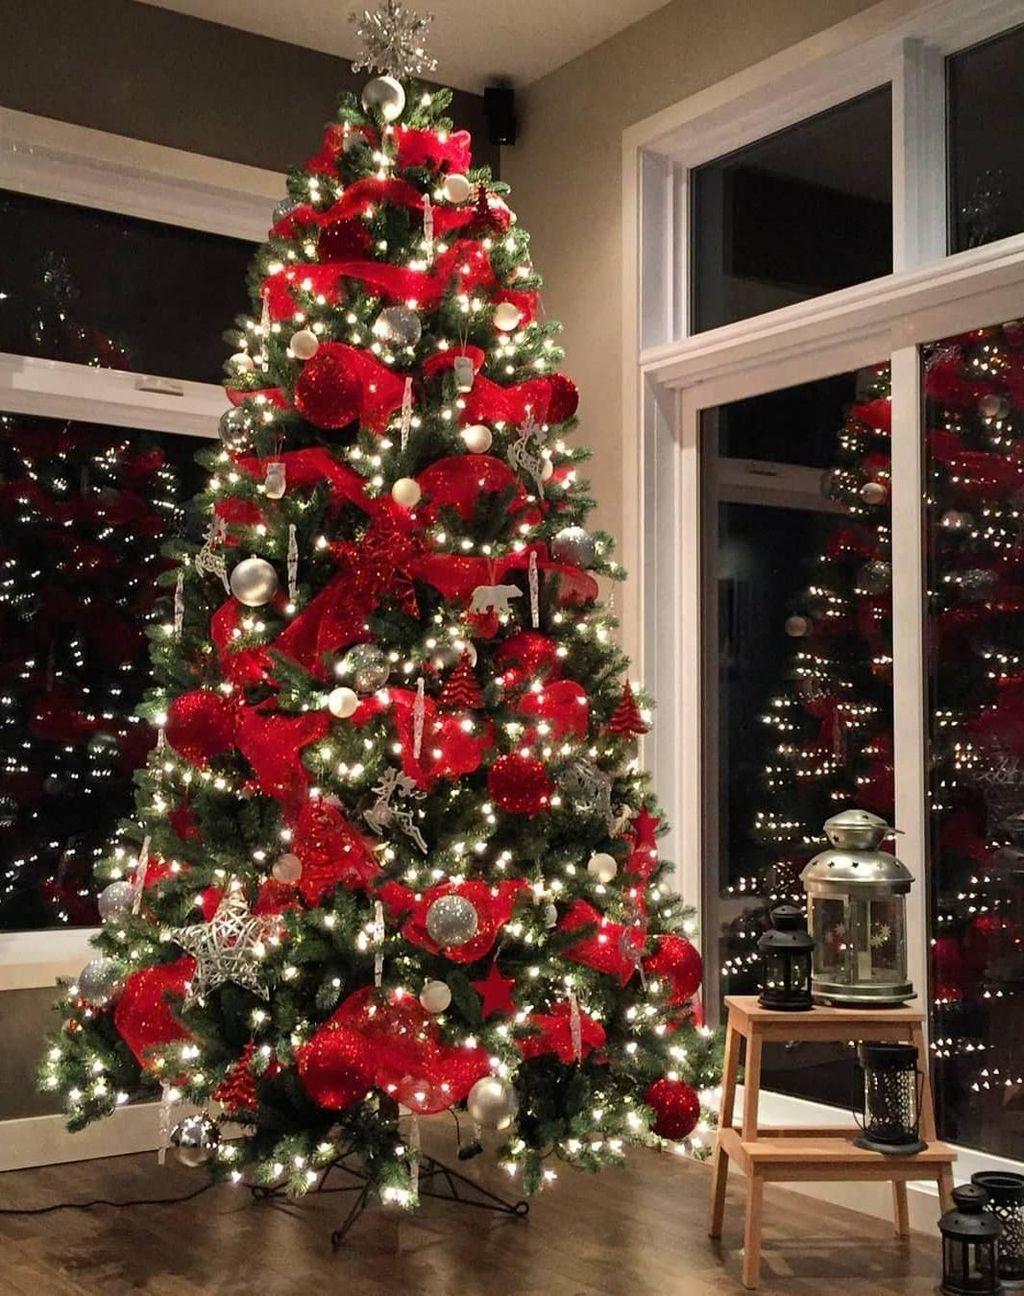 42 Amazing Christmas Lights Tree Decoration Ideas Pimphomee Fun Christmas Decorations Christmas Tree Inspiration Christmas Lights